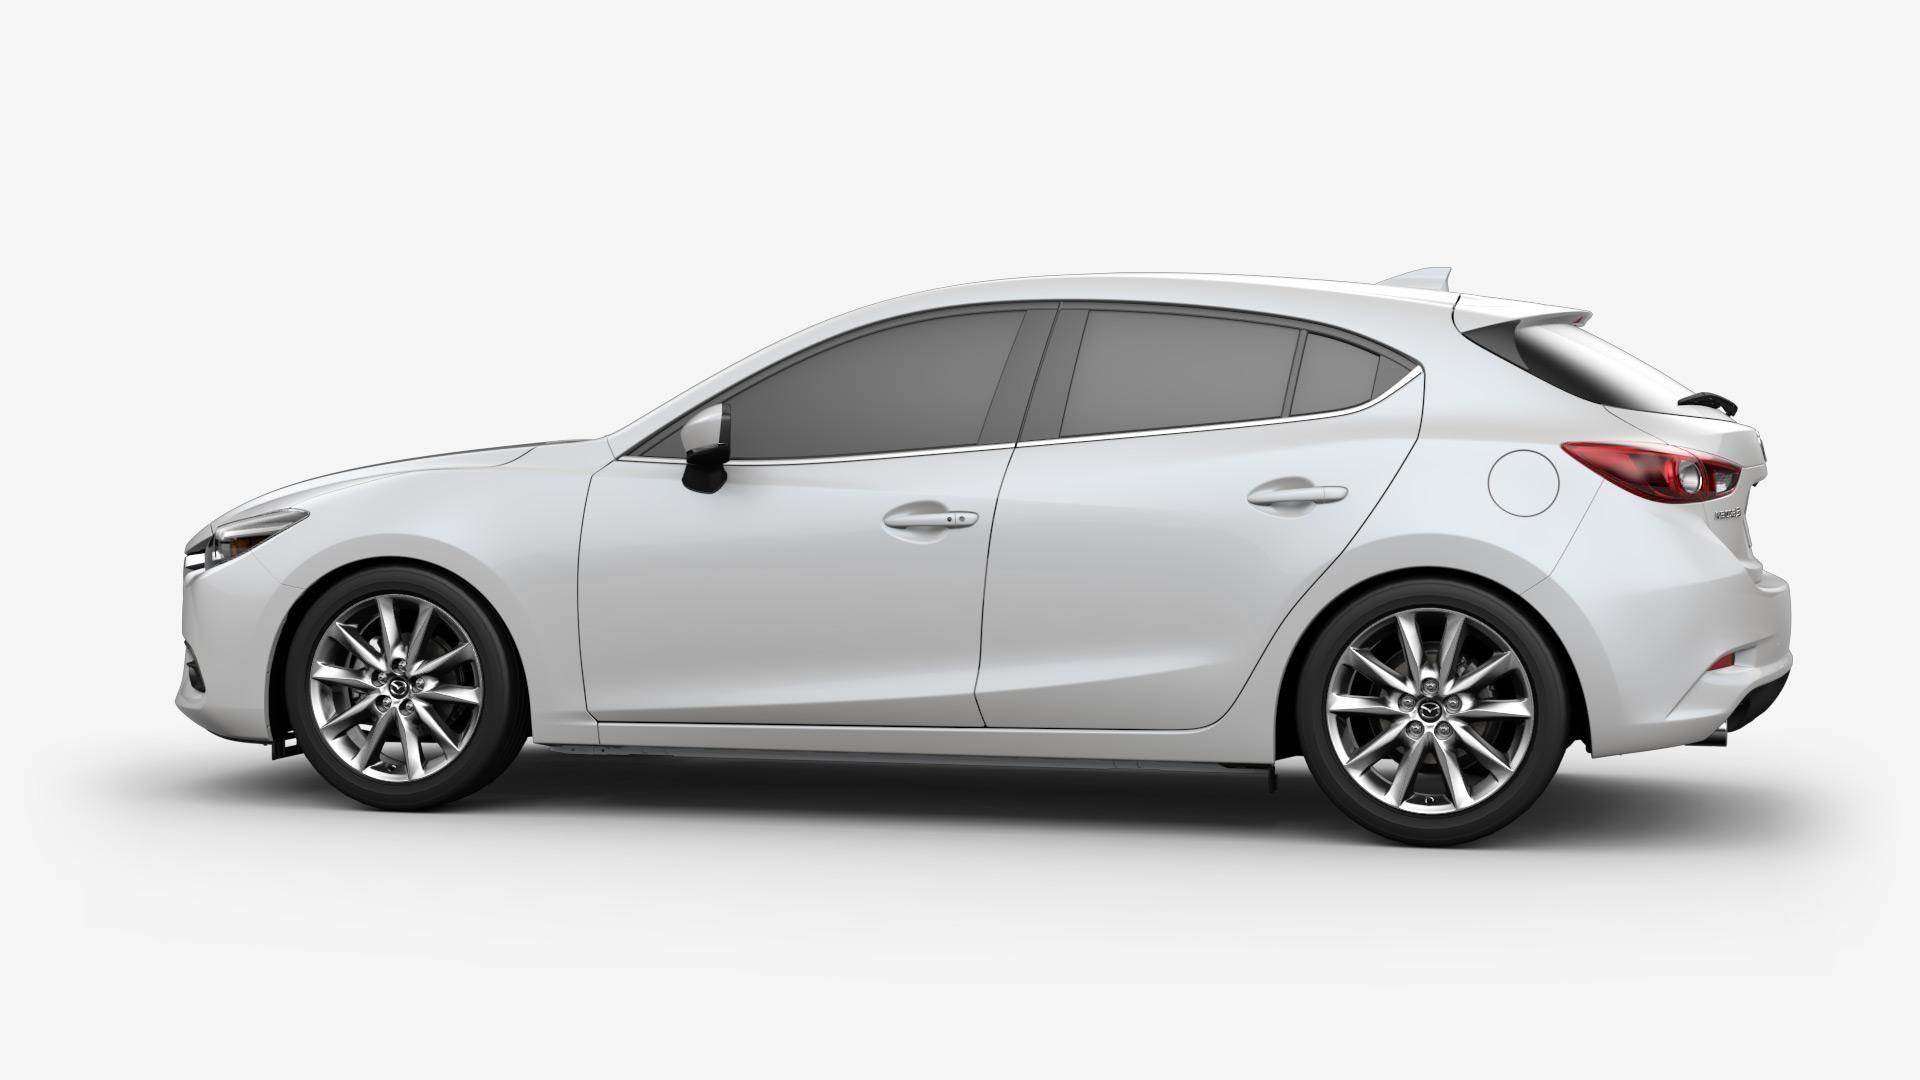 Kelebihan Mazda 3 2018 Harga